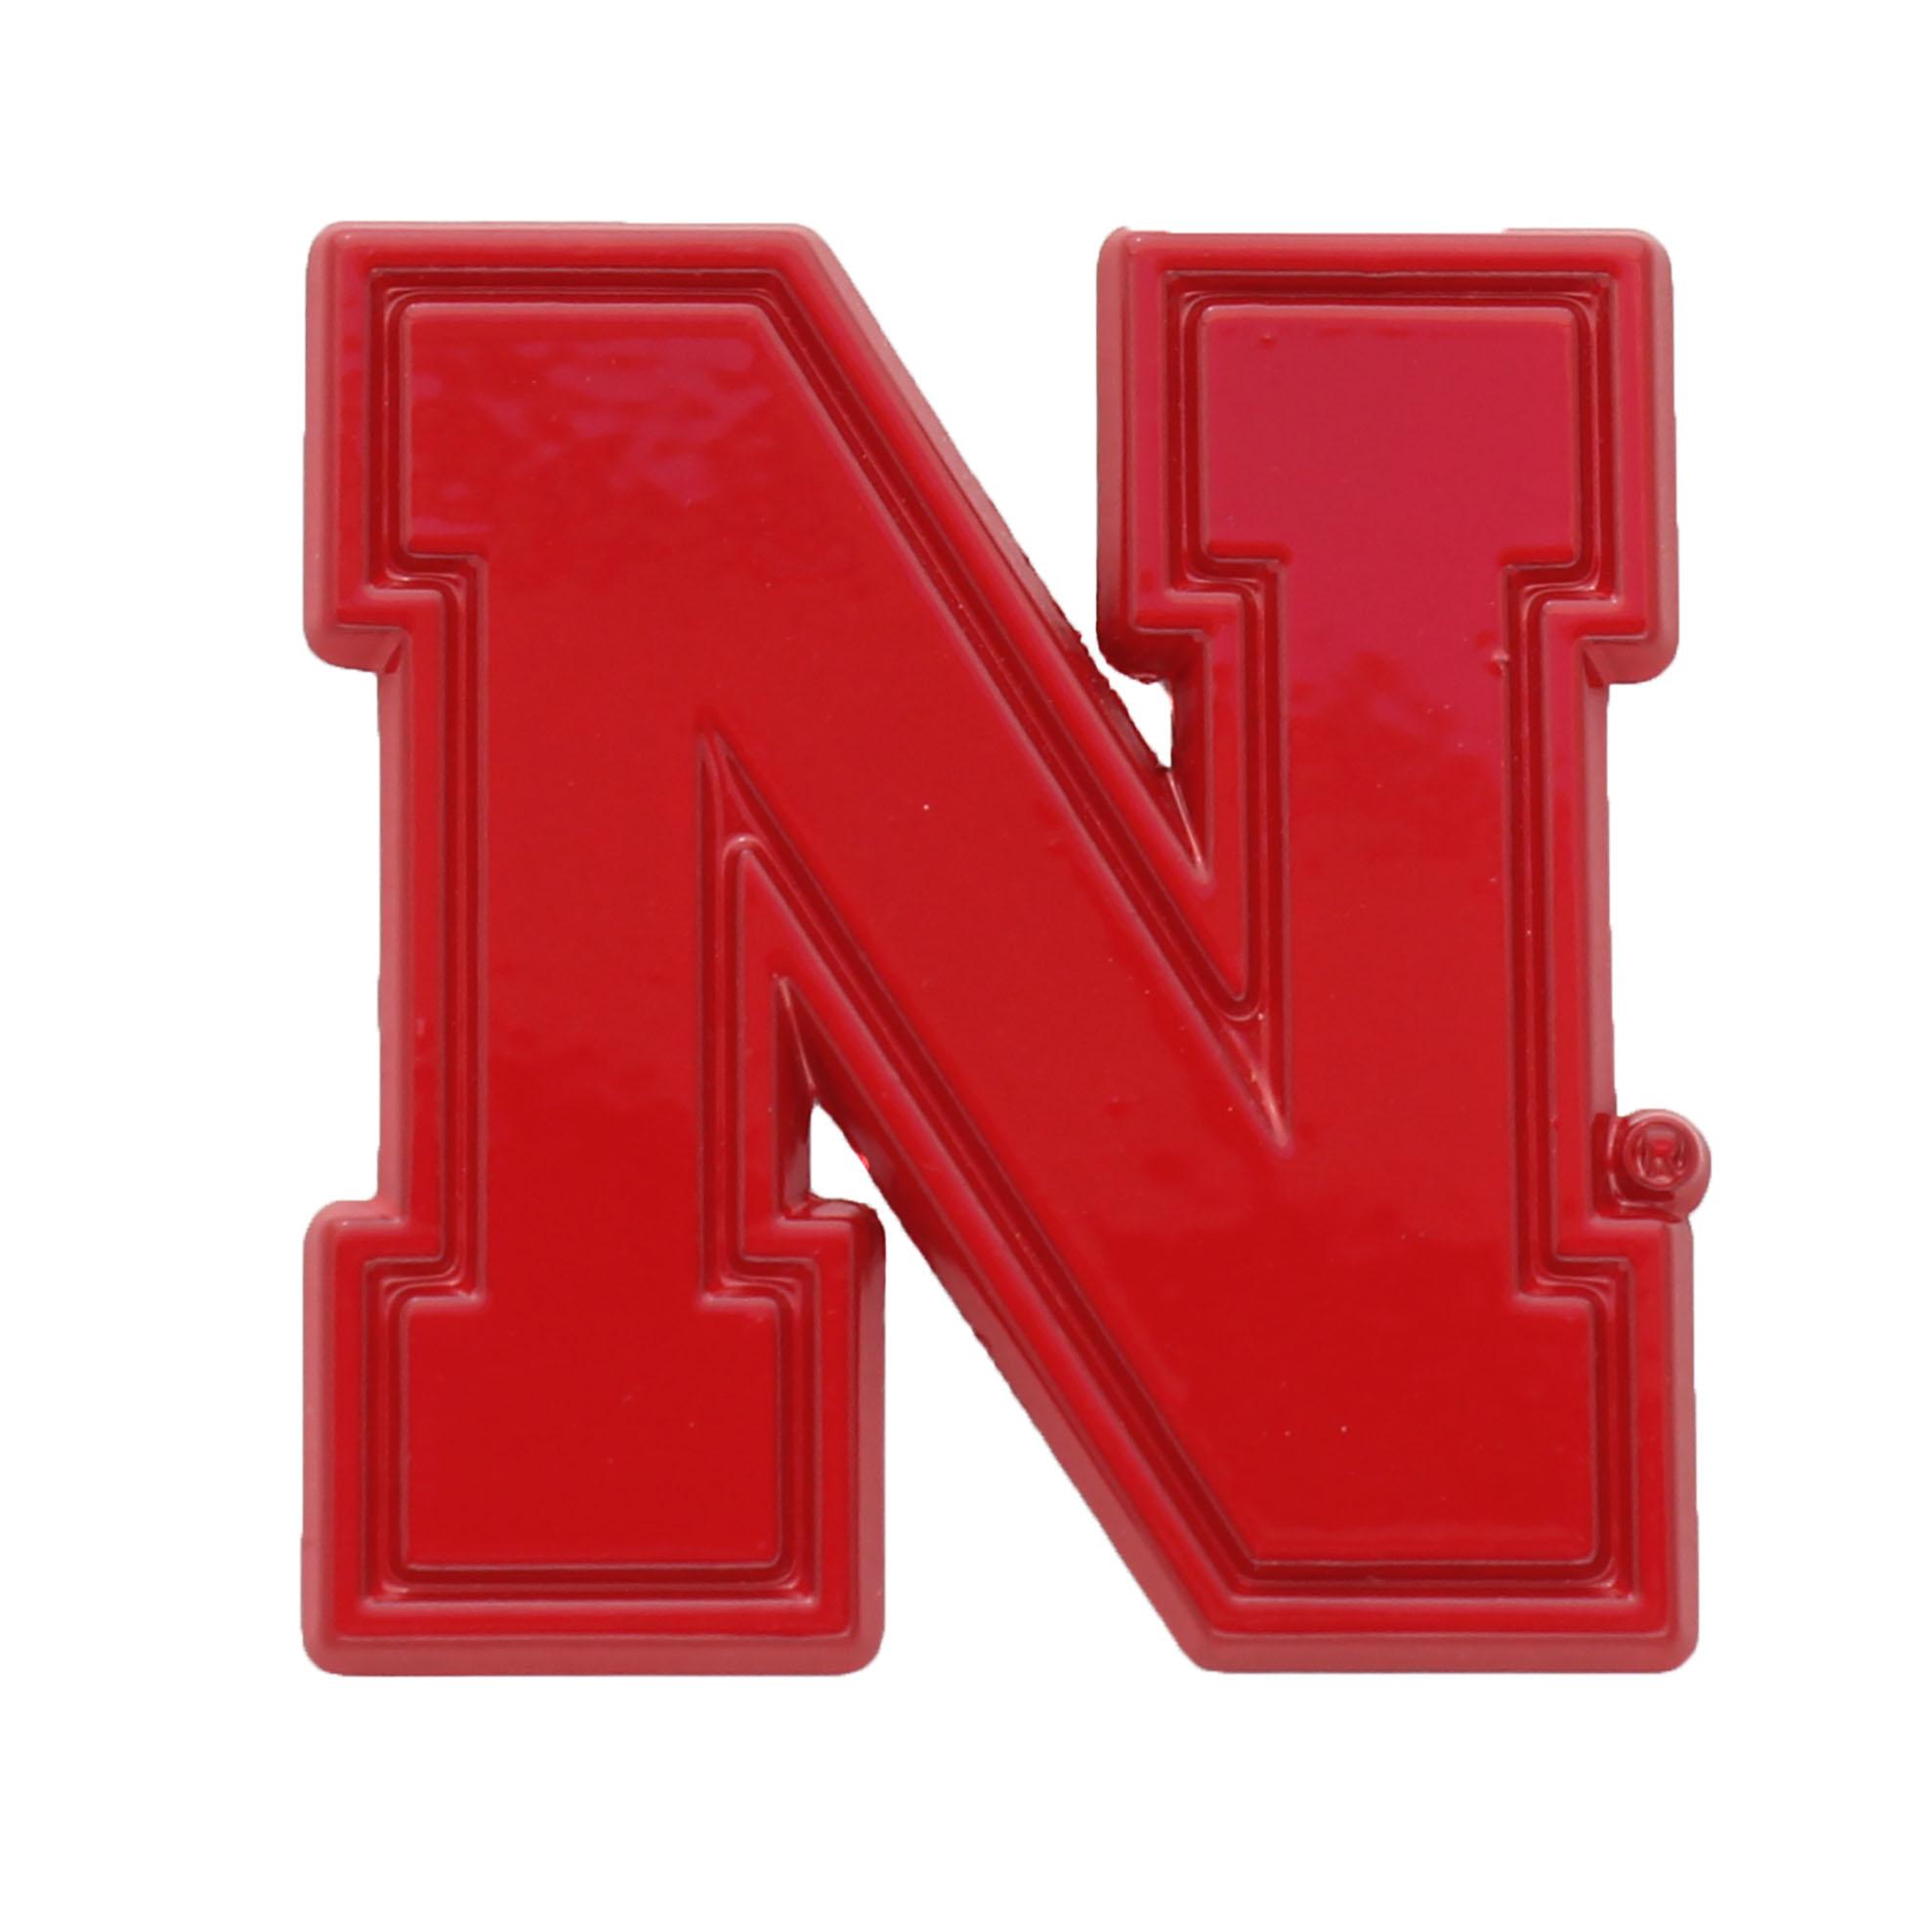 Nebraska Red Metal Auto Emblem Car Emblems Auto Emblems Tow